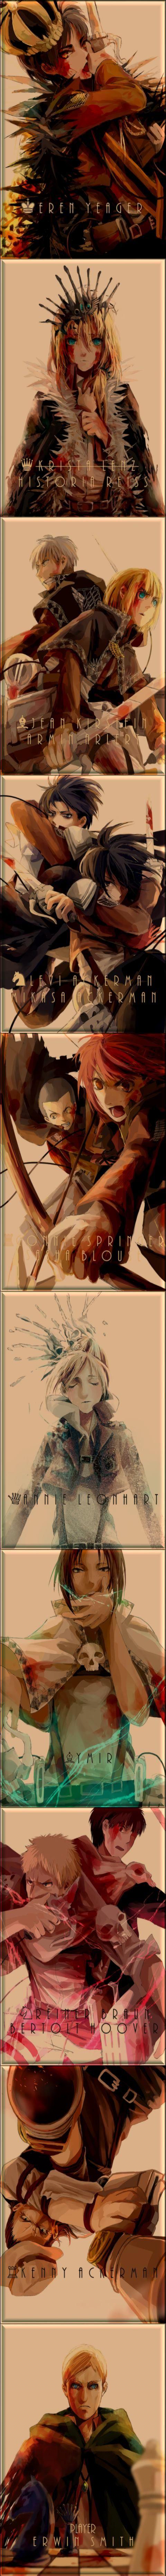 Shingeki no kyojin//Attack on titan// Ataque a los titanes